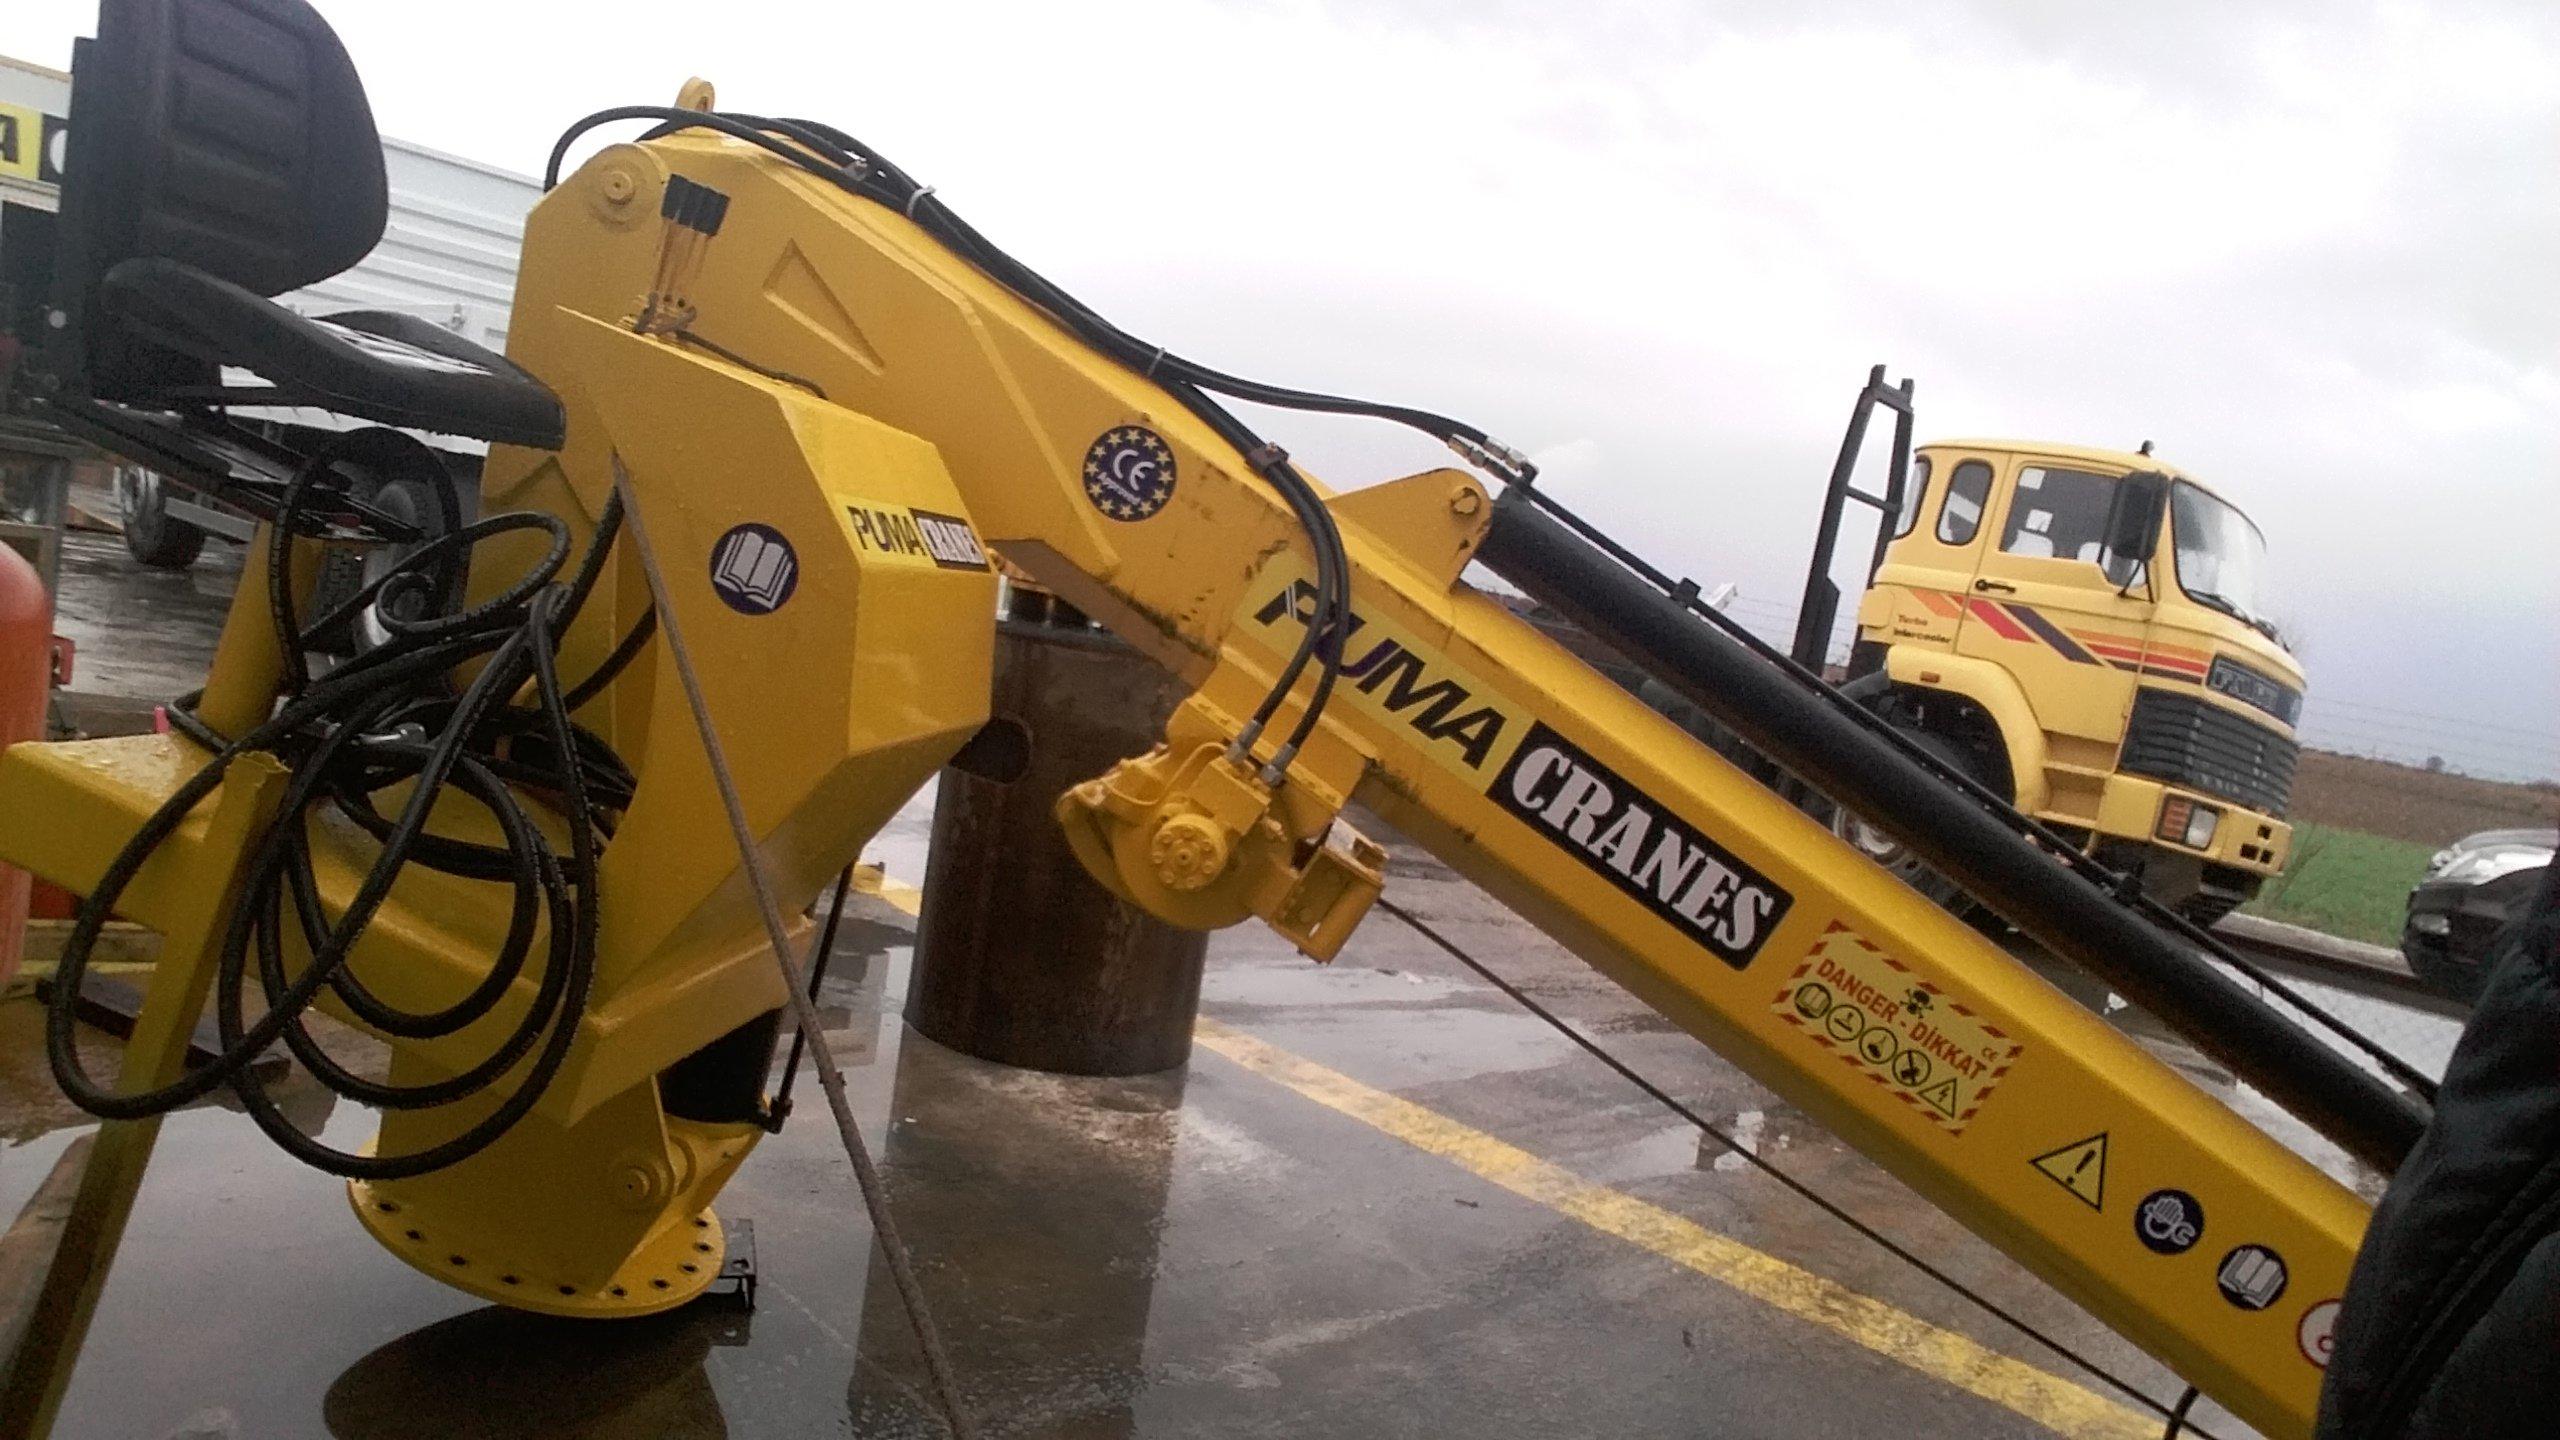 puma-marine-crane766719.jpg